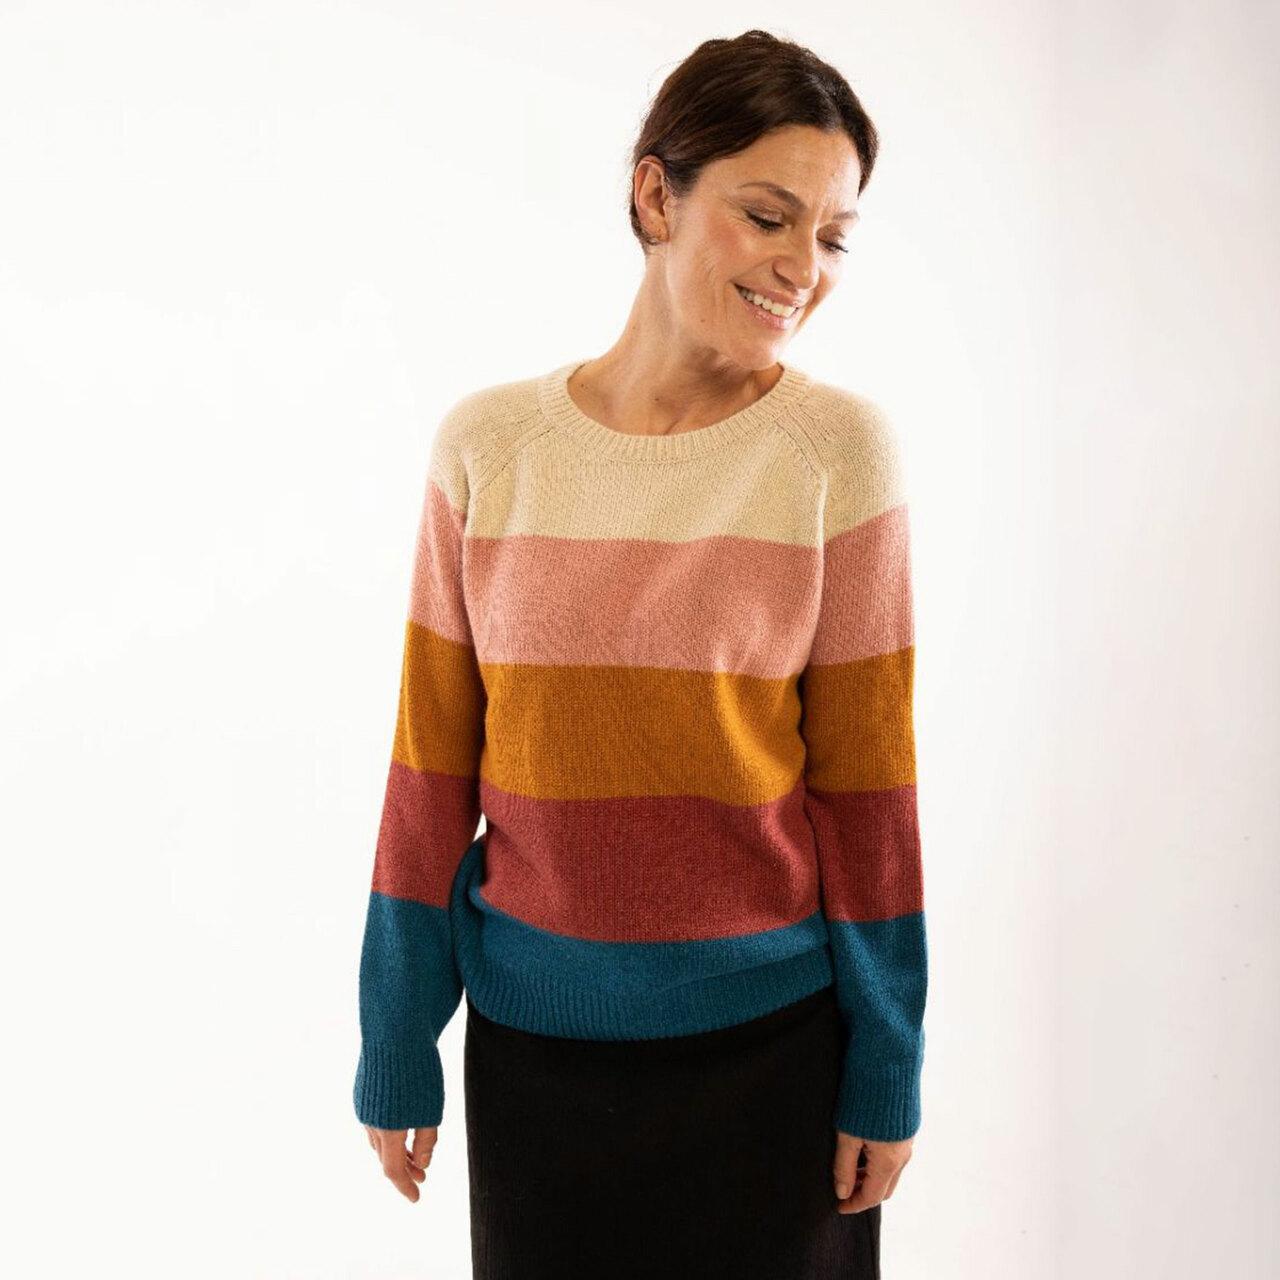 Danefae Pullover 'Lisa' von Danefae Multicolor